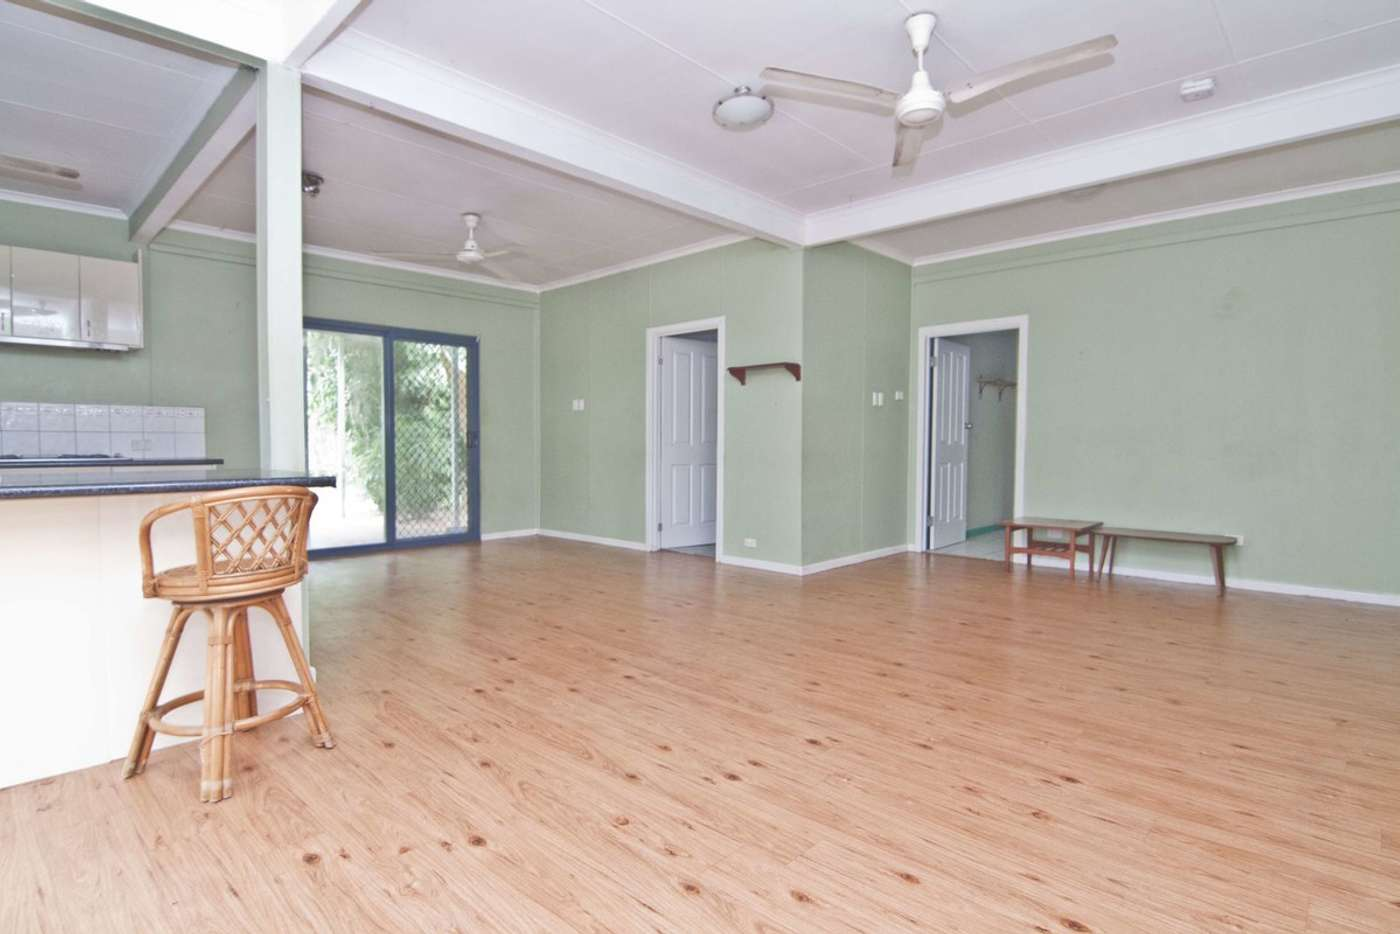 Main view of Homely house listing, 16 Calytrix Avenue, Kununurra WA 6743